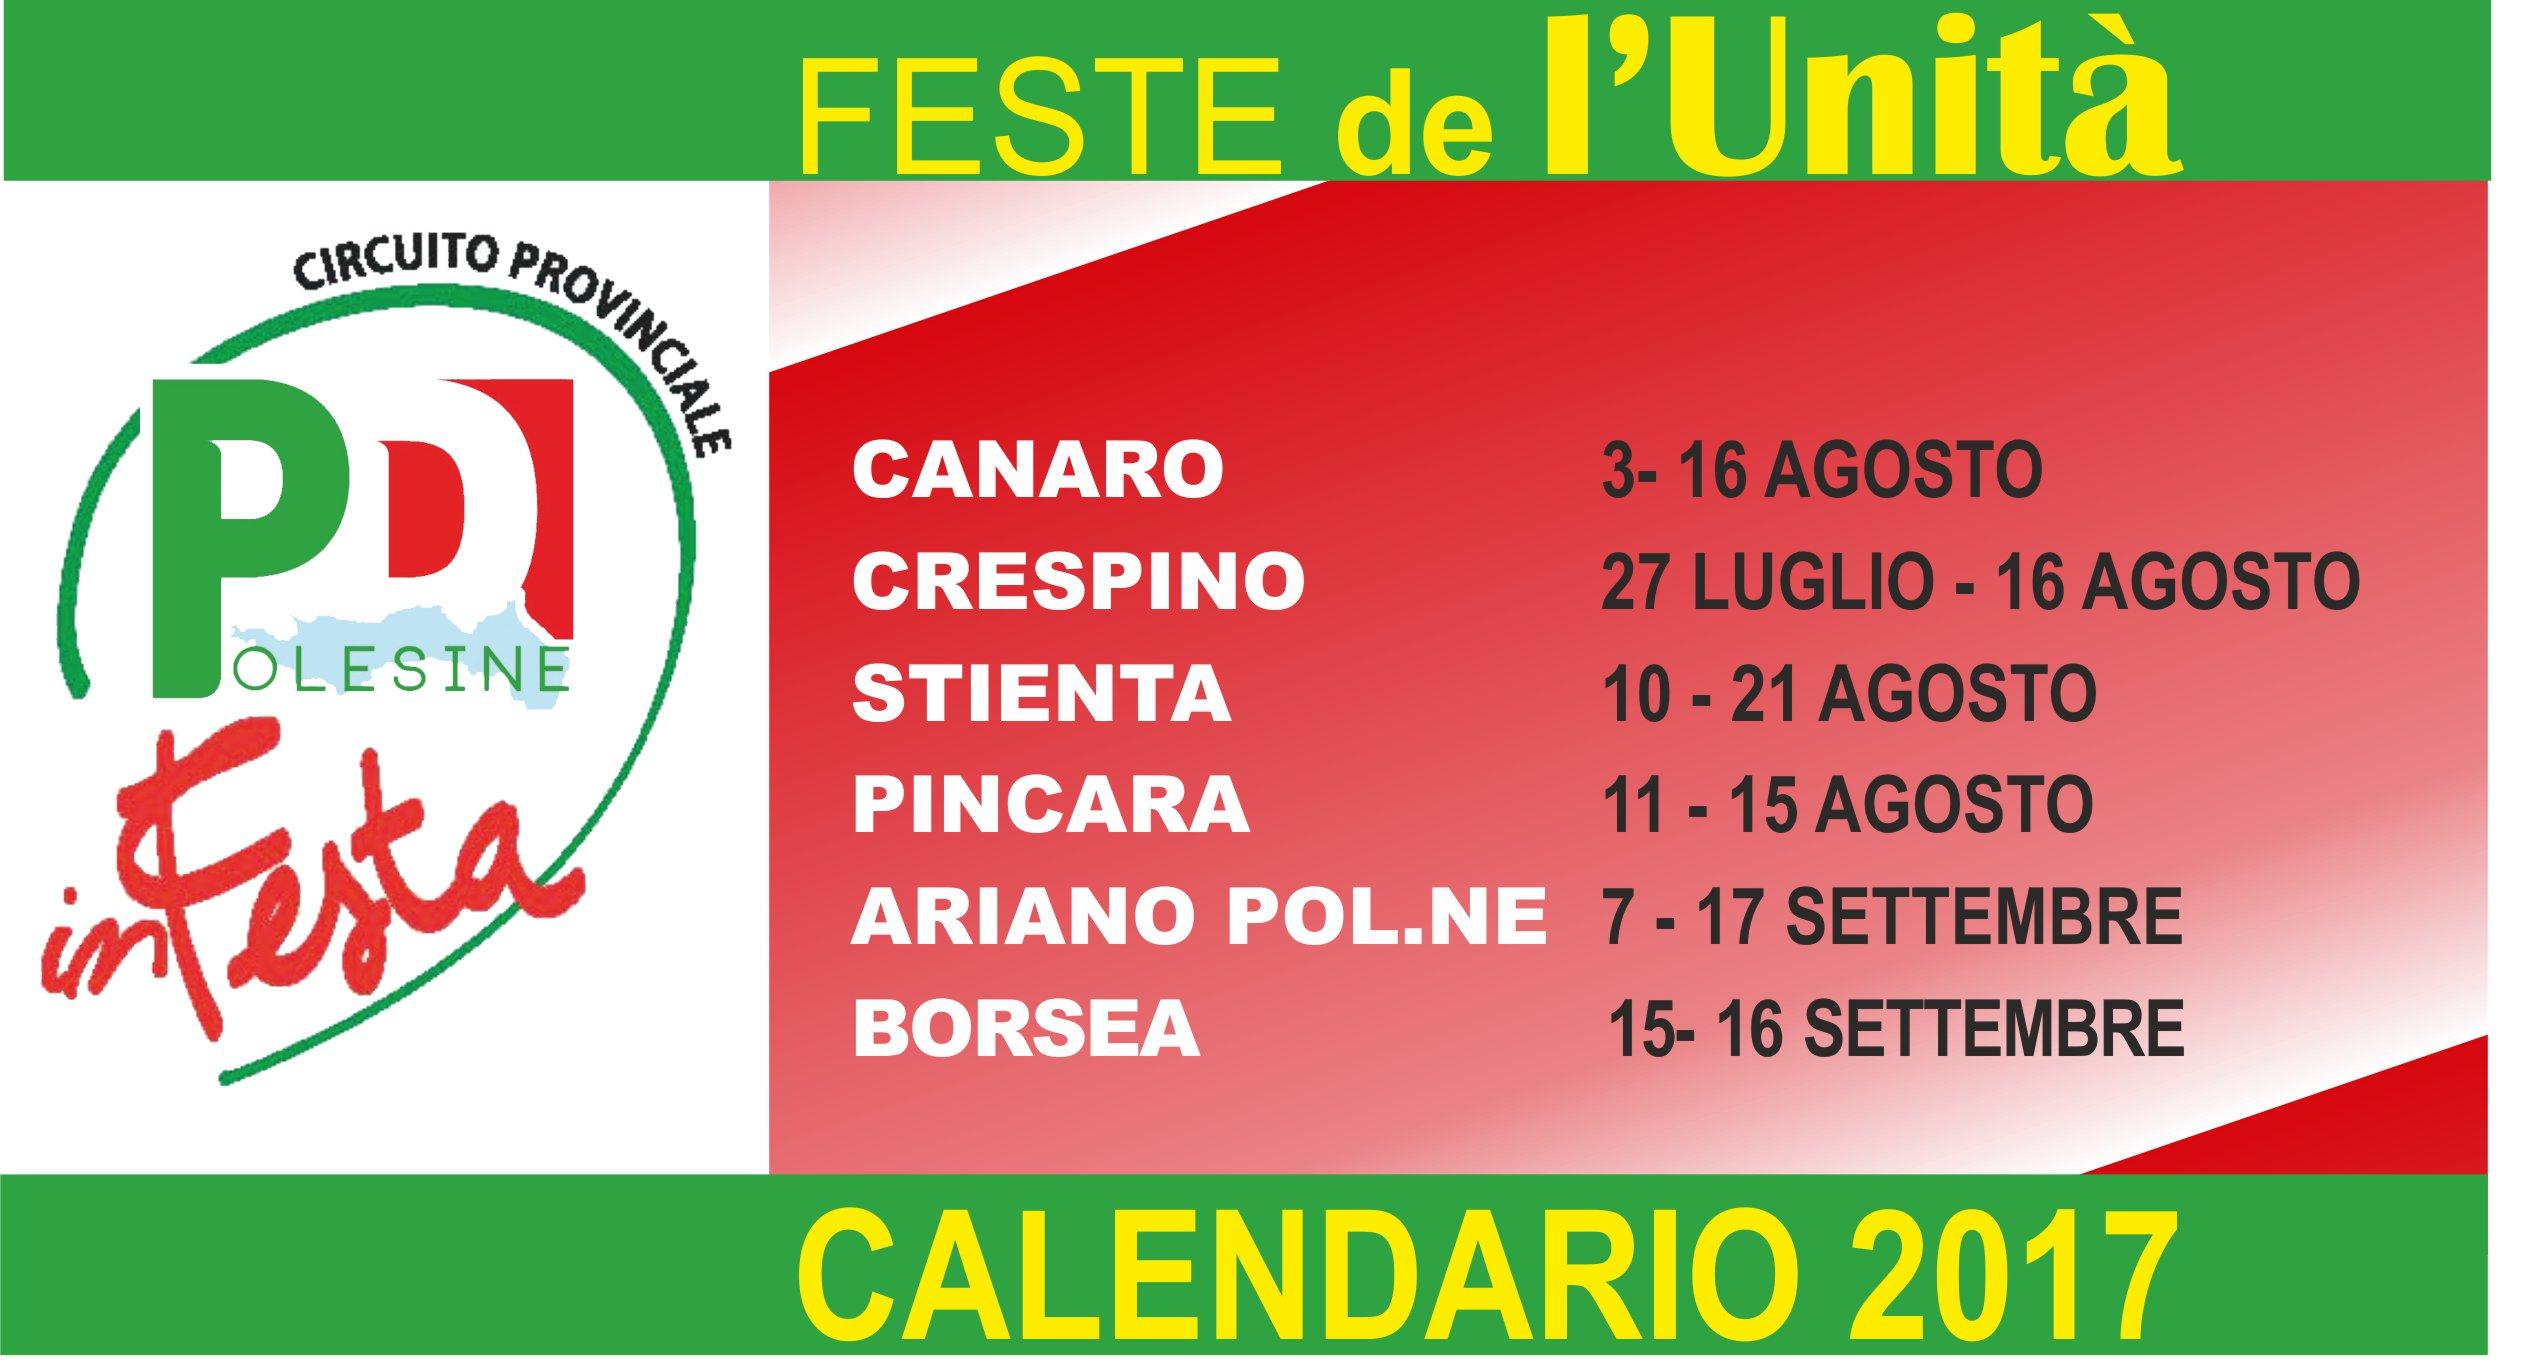 Calendario Feste de l'Unità Polesane